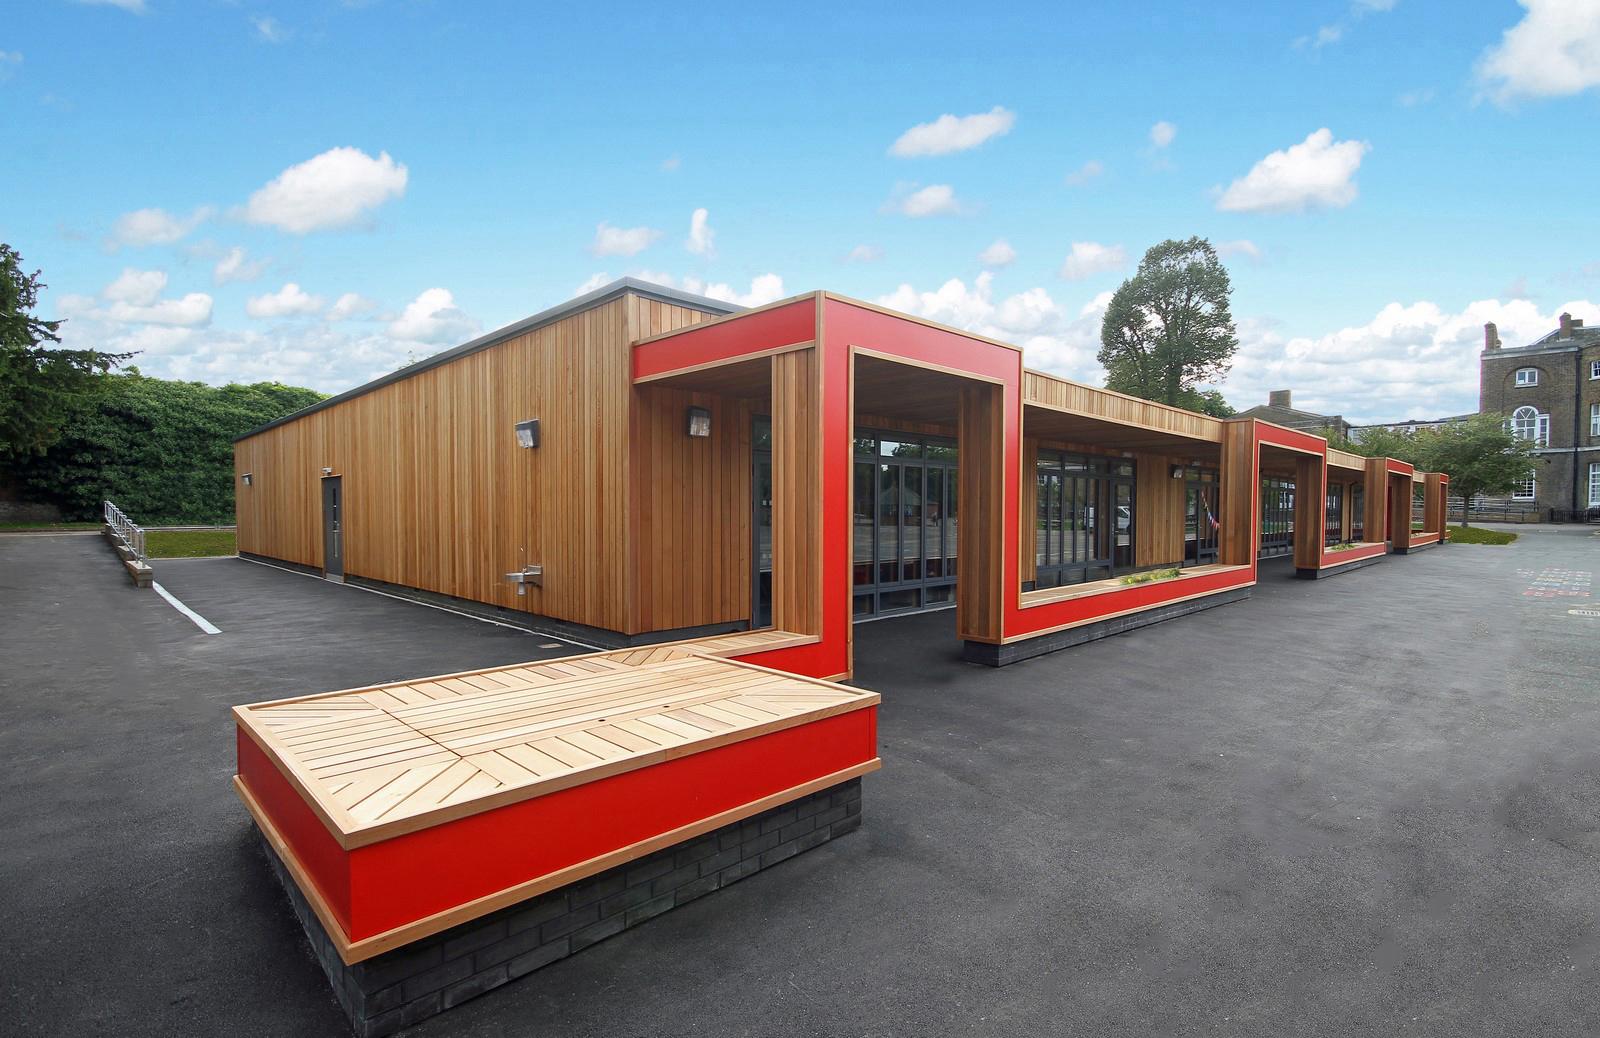 Parish-CoE-Primary-School-External-Canopy-EDIT